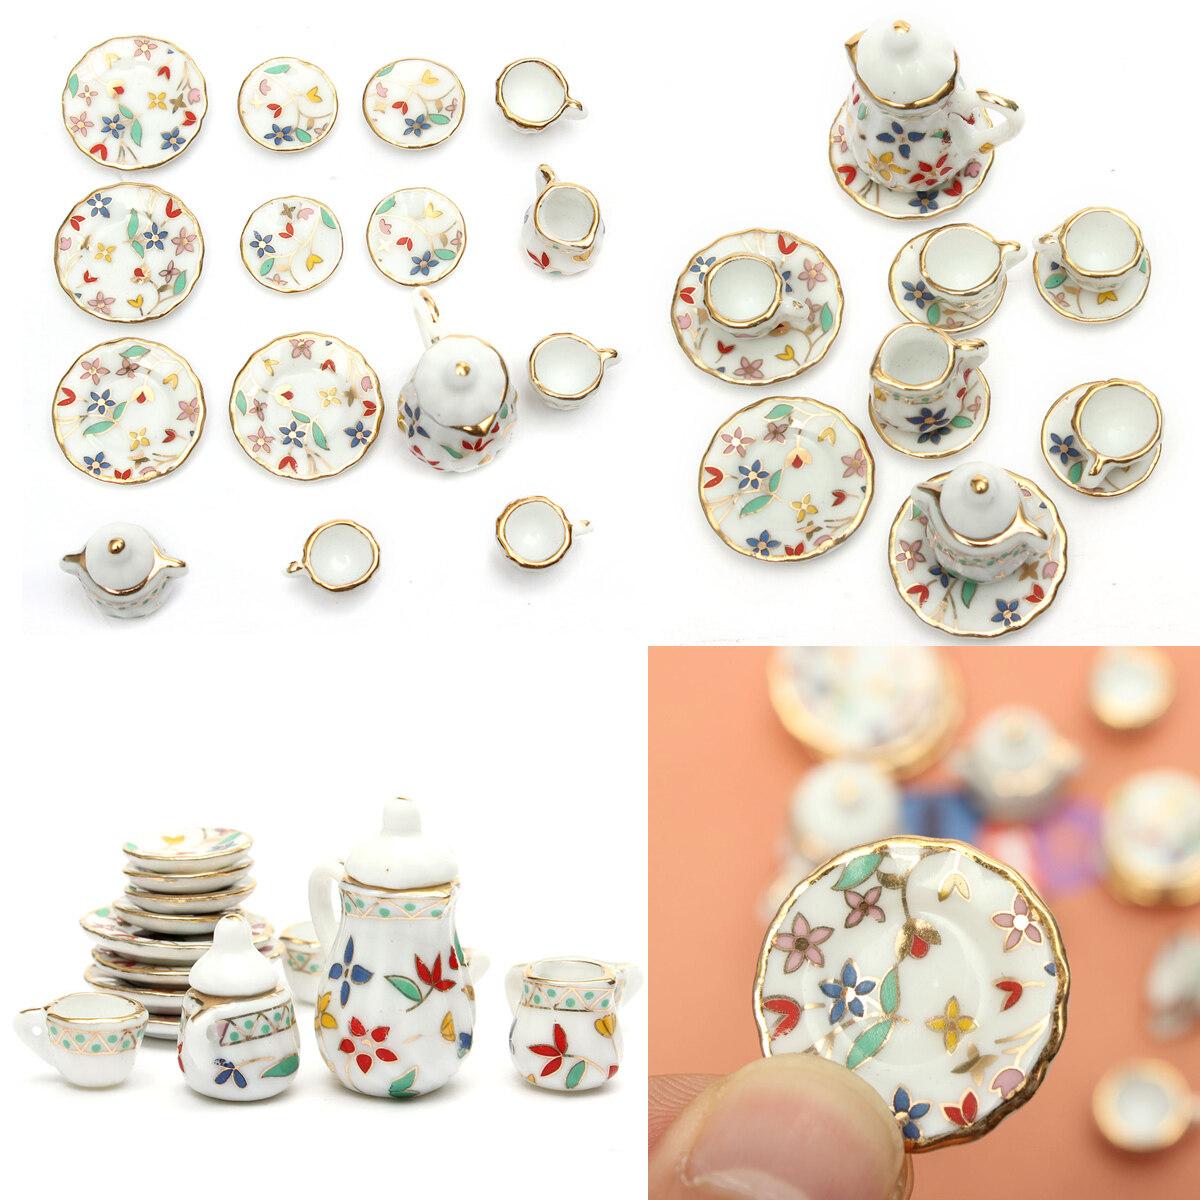 1 Set 15pcs Dollhouse Miniature Furniture Dining Porcelain Tea Set Floral Print - intl